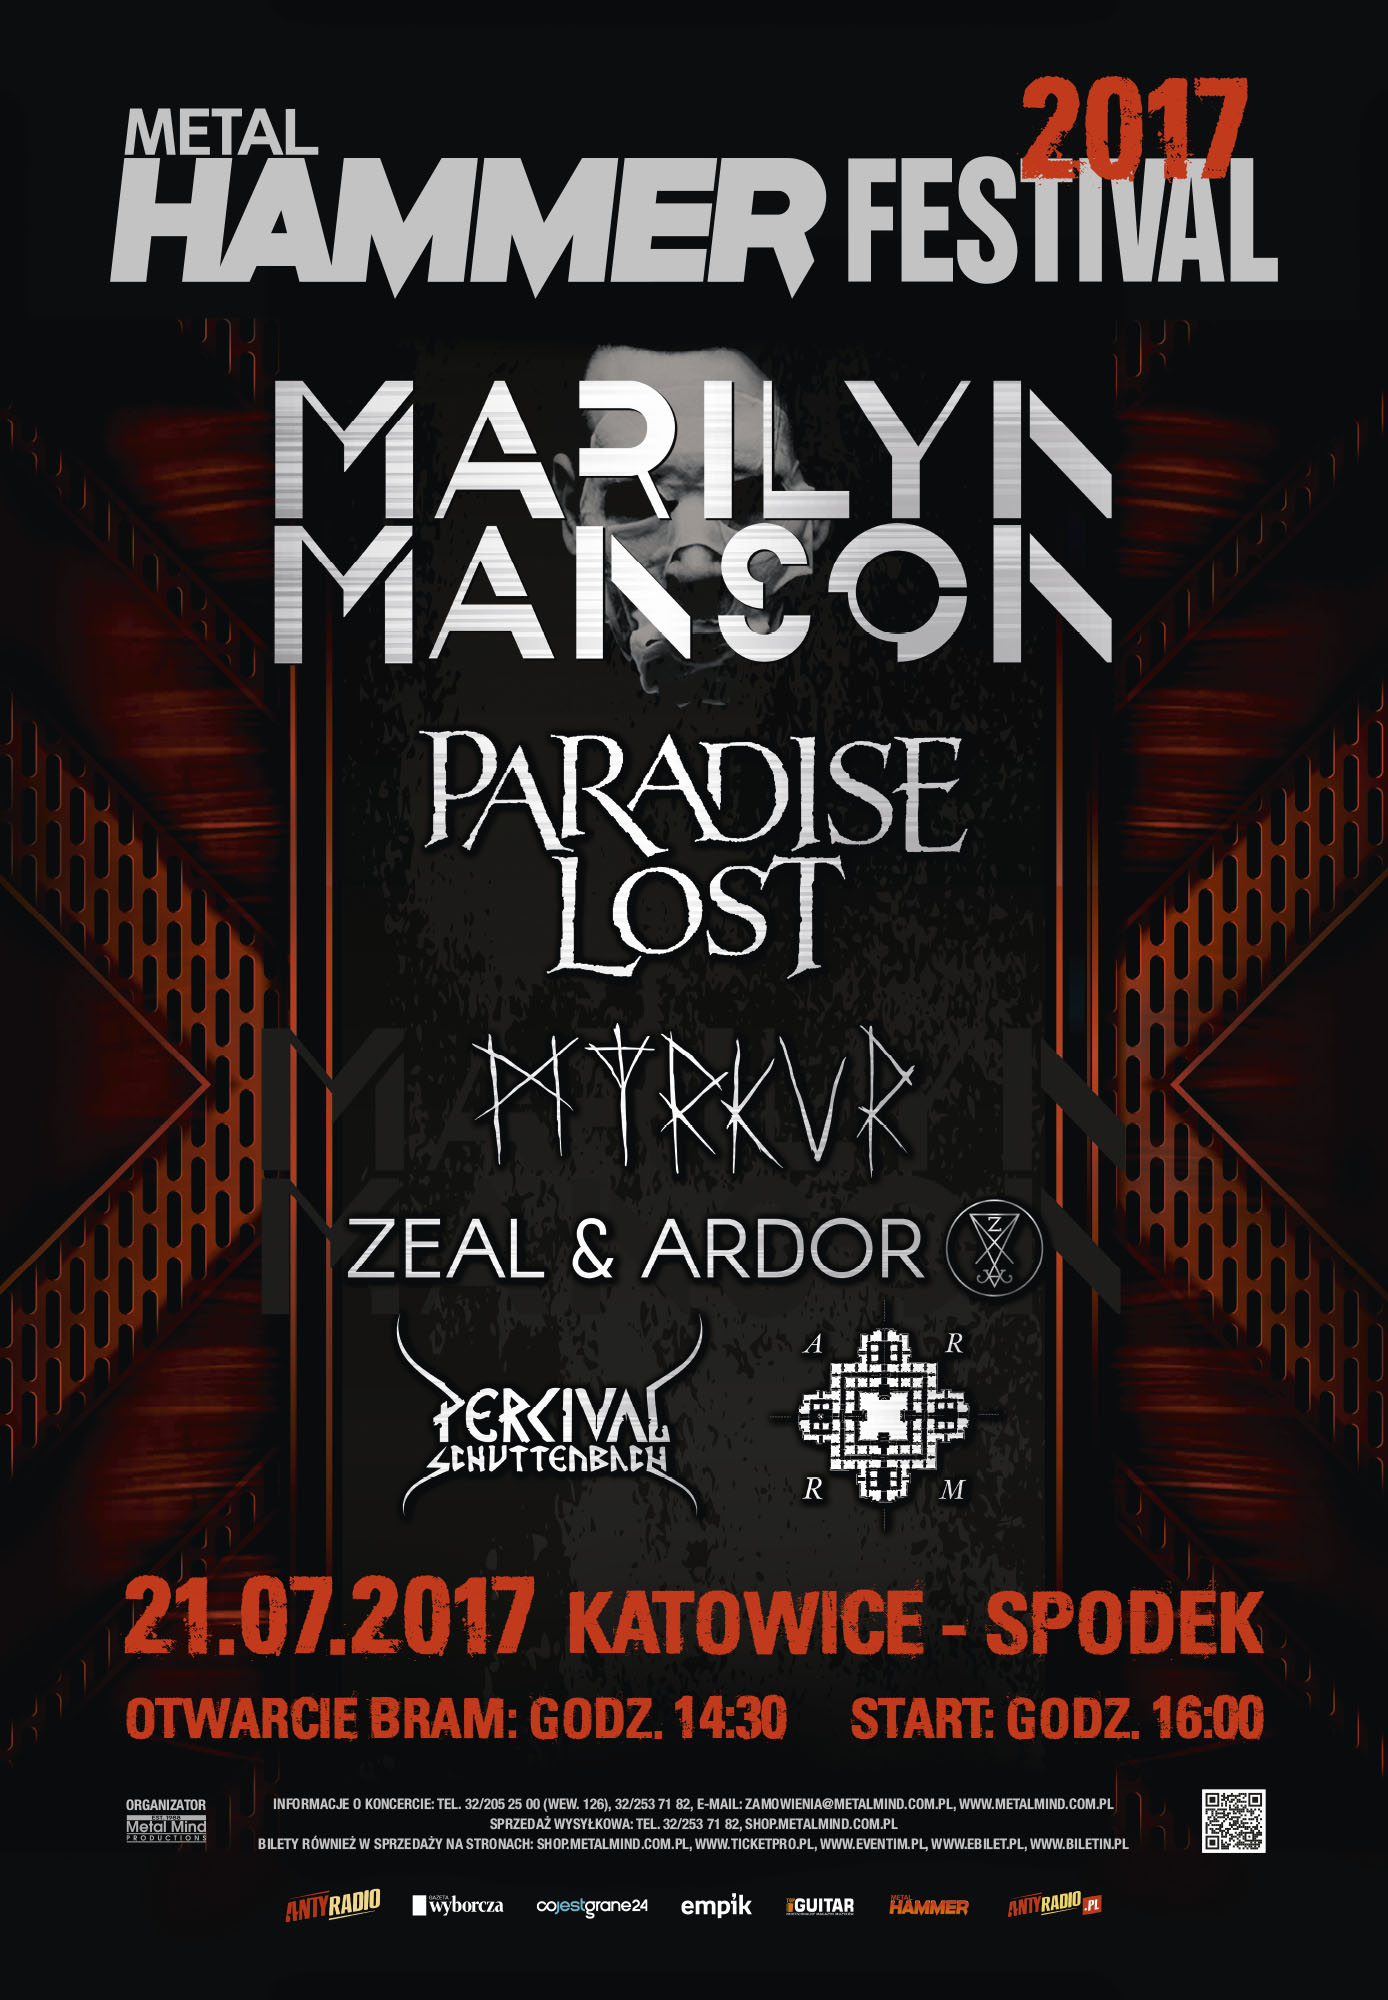 Metal Hammer Festival 2017 Akademickie Radio Centrum 890 Fm